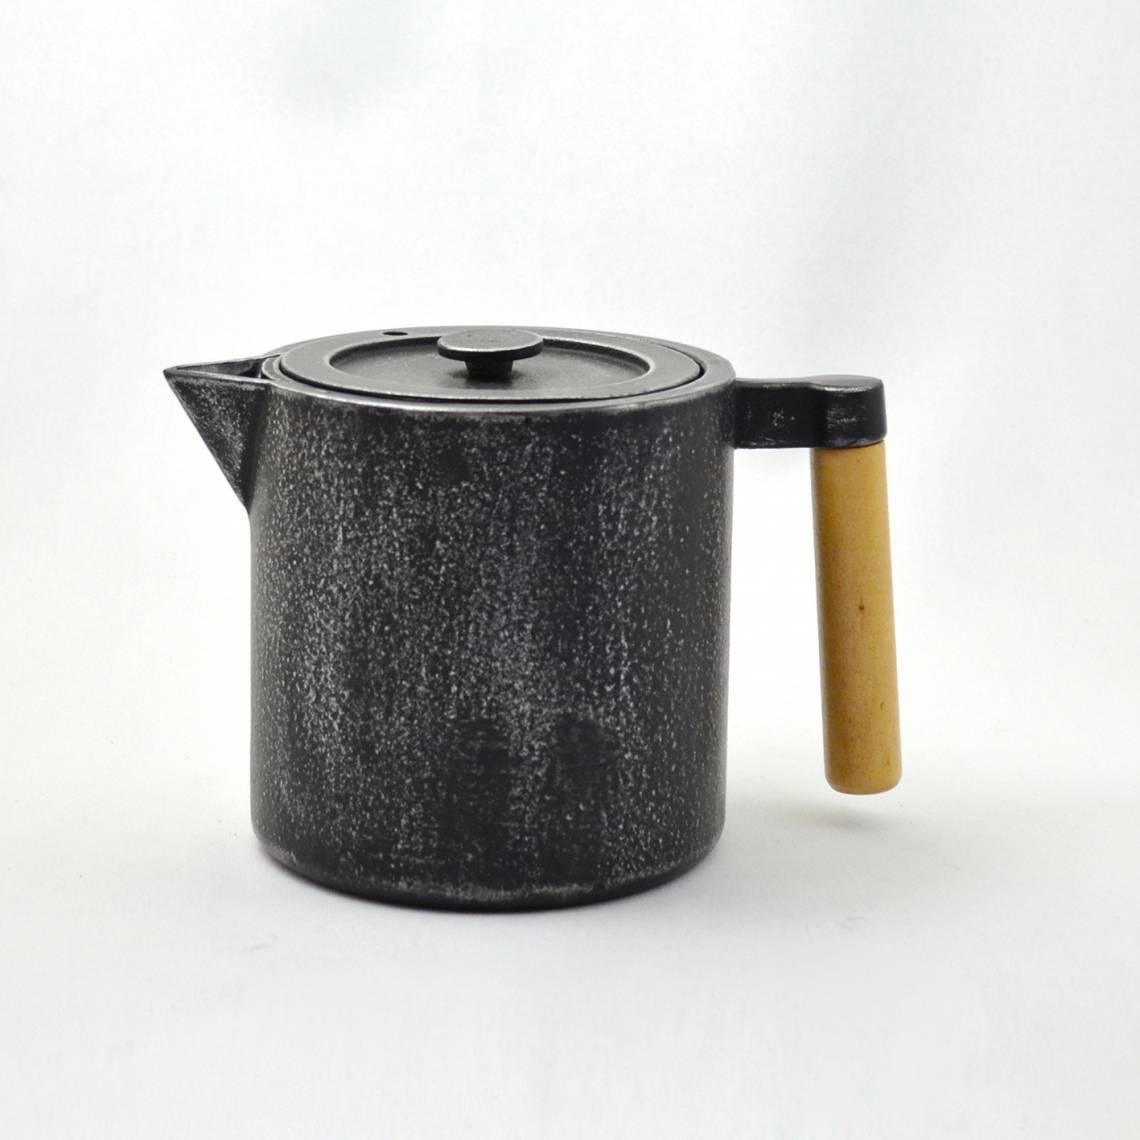 JA-UNENDLICH: Teekannen aus Gusseisen, Bauhaus, Modell Chiisana, 0,9 l, 2299